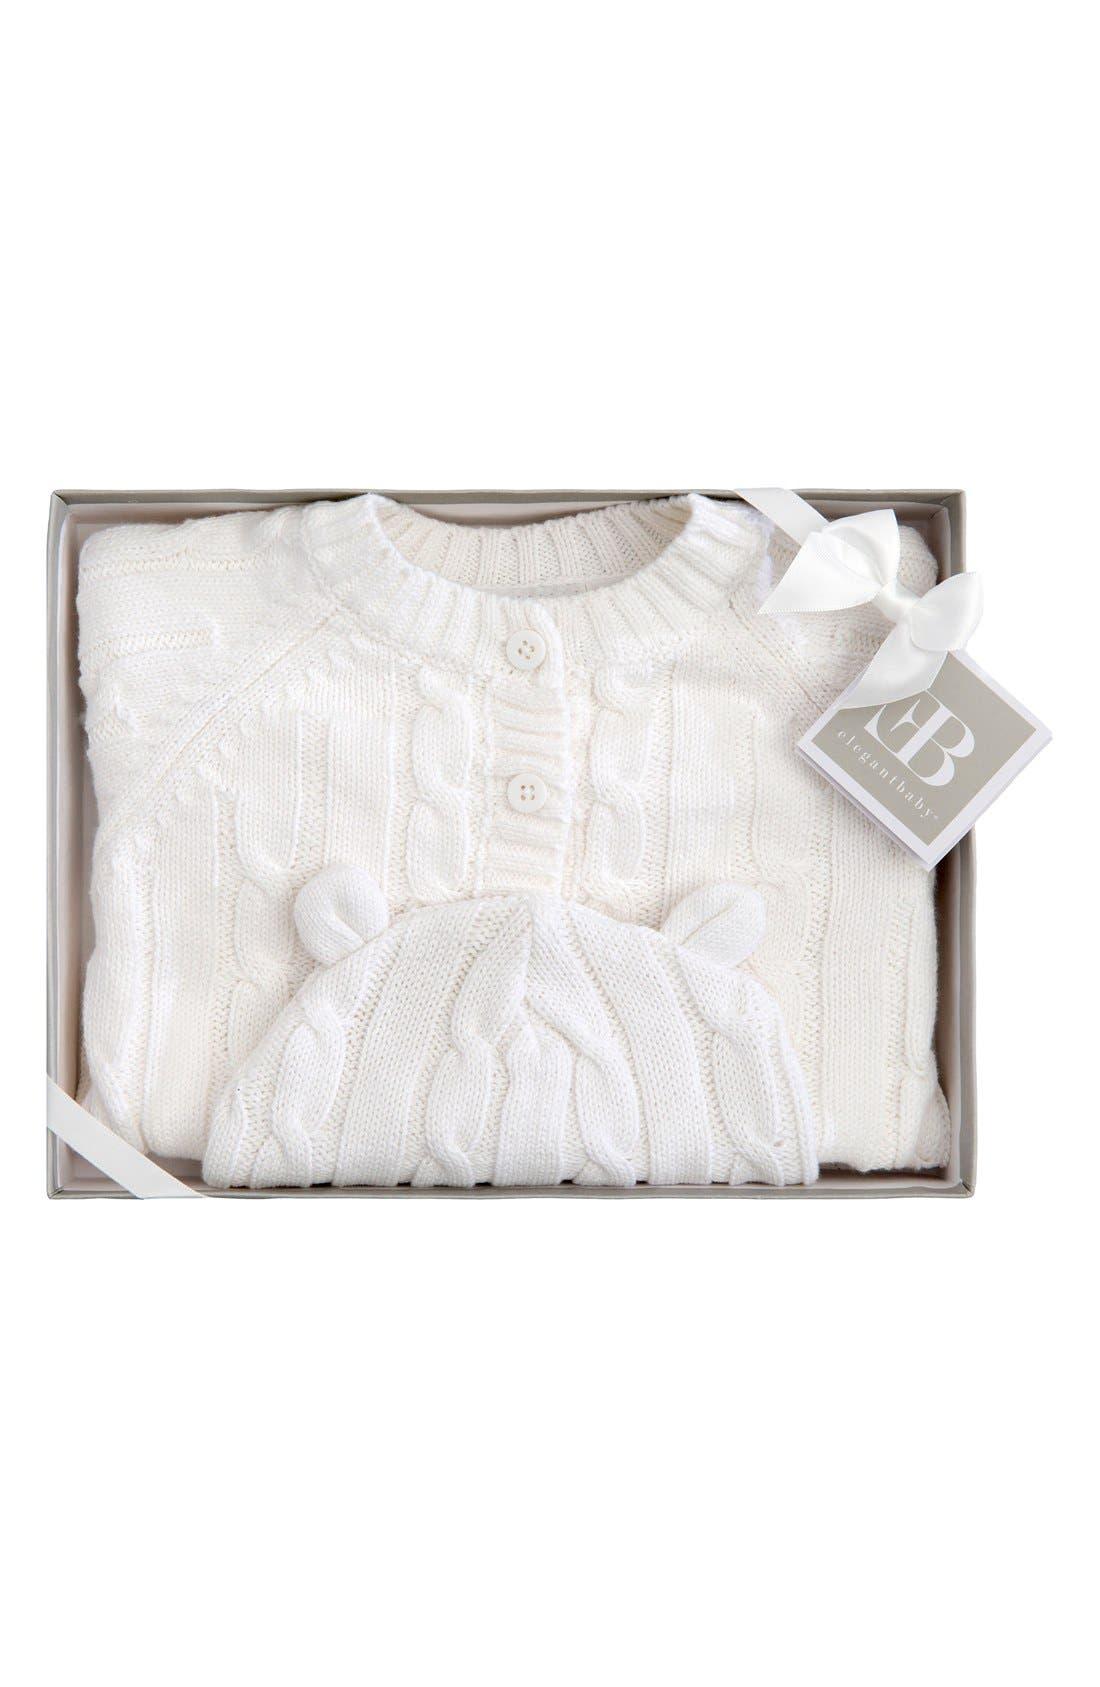 Cable Knit Sweater & Hat Set,                             Alternate thumbnail 2, color,                             WHITE